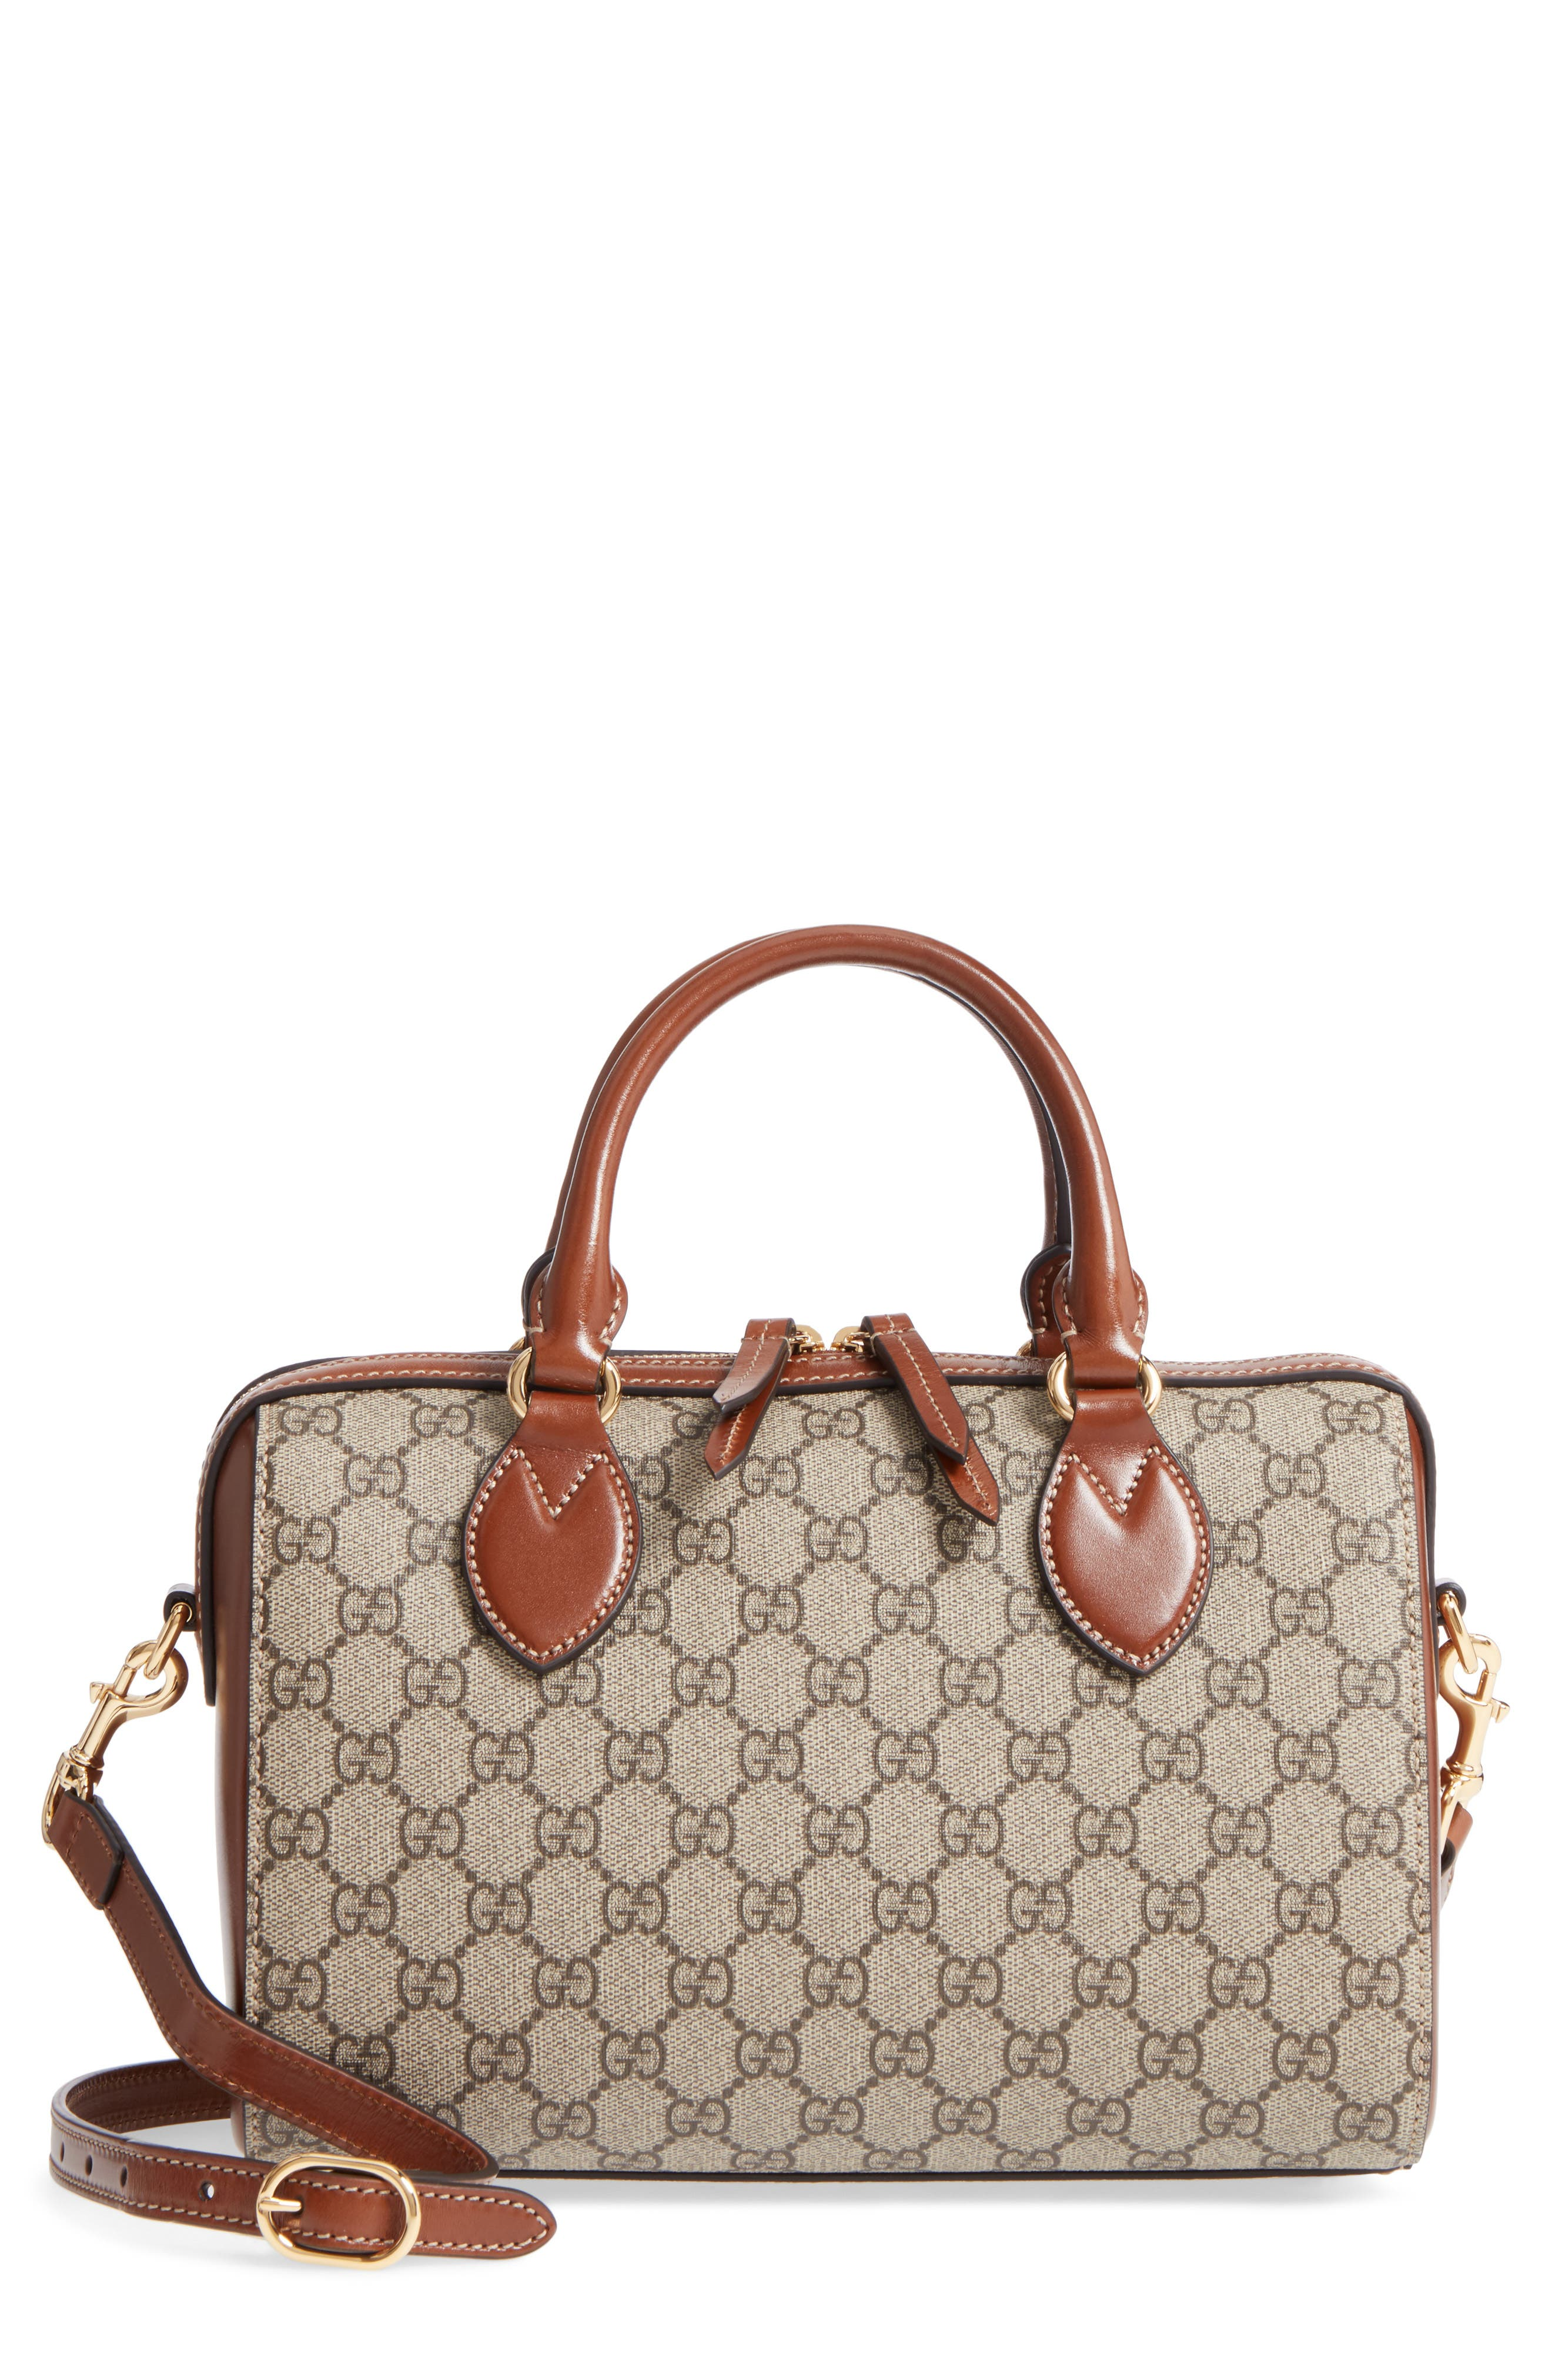 Main Image - Gucci Linea Top Handle GG Supreme Canvas & Leather Bag